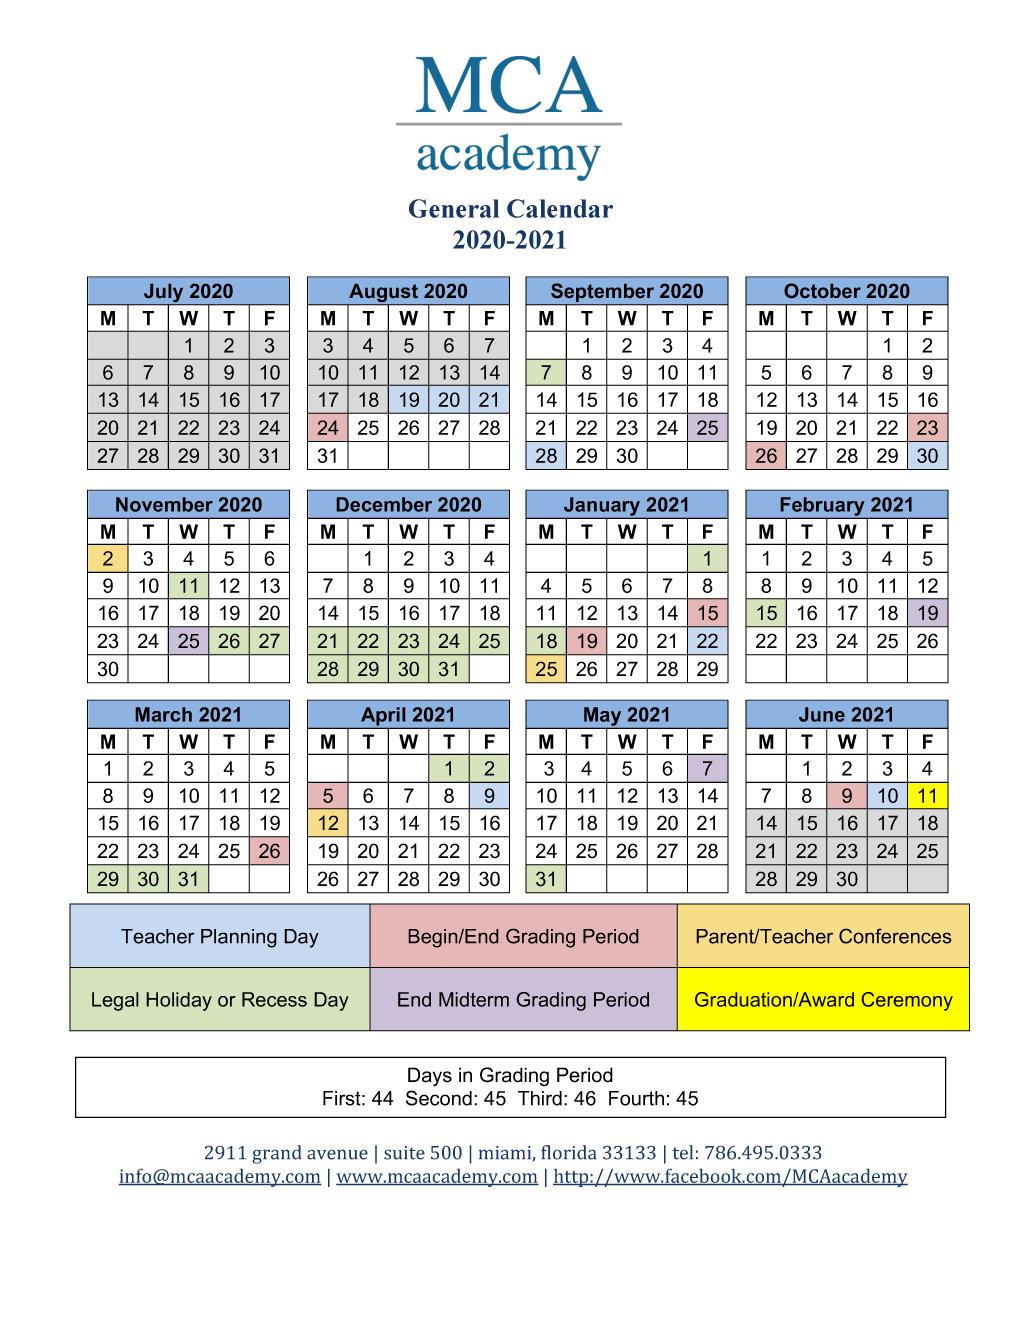 University Of Miami Spring 2022 Calendar.School Calendar 2020 2021 Mca Academy